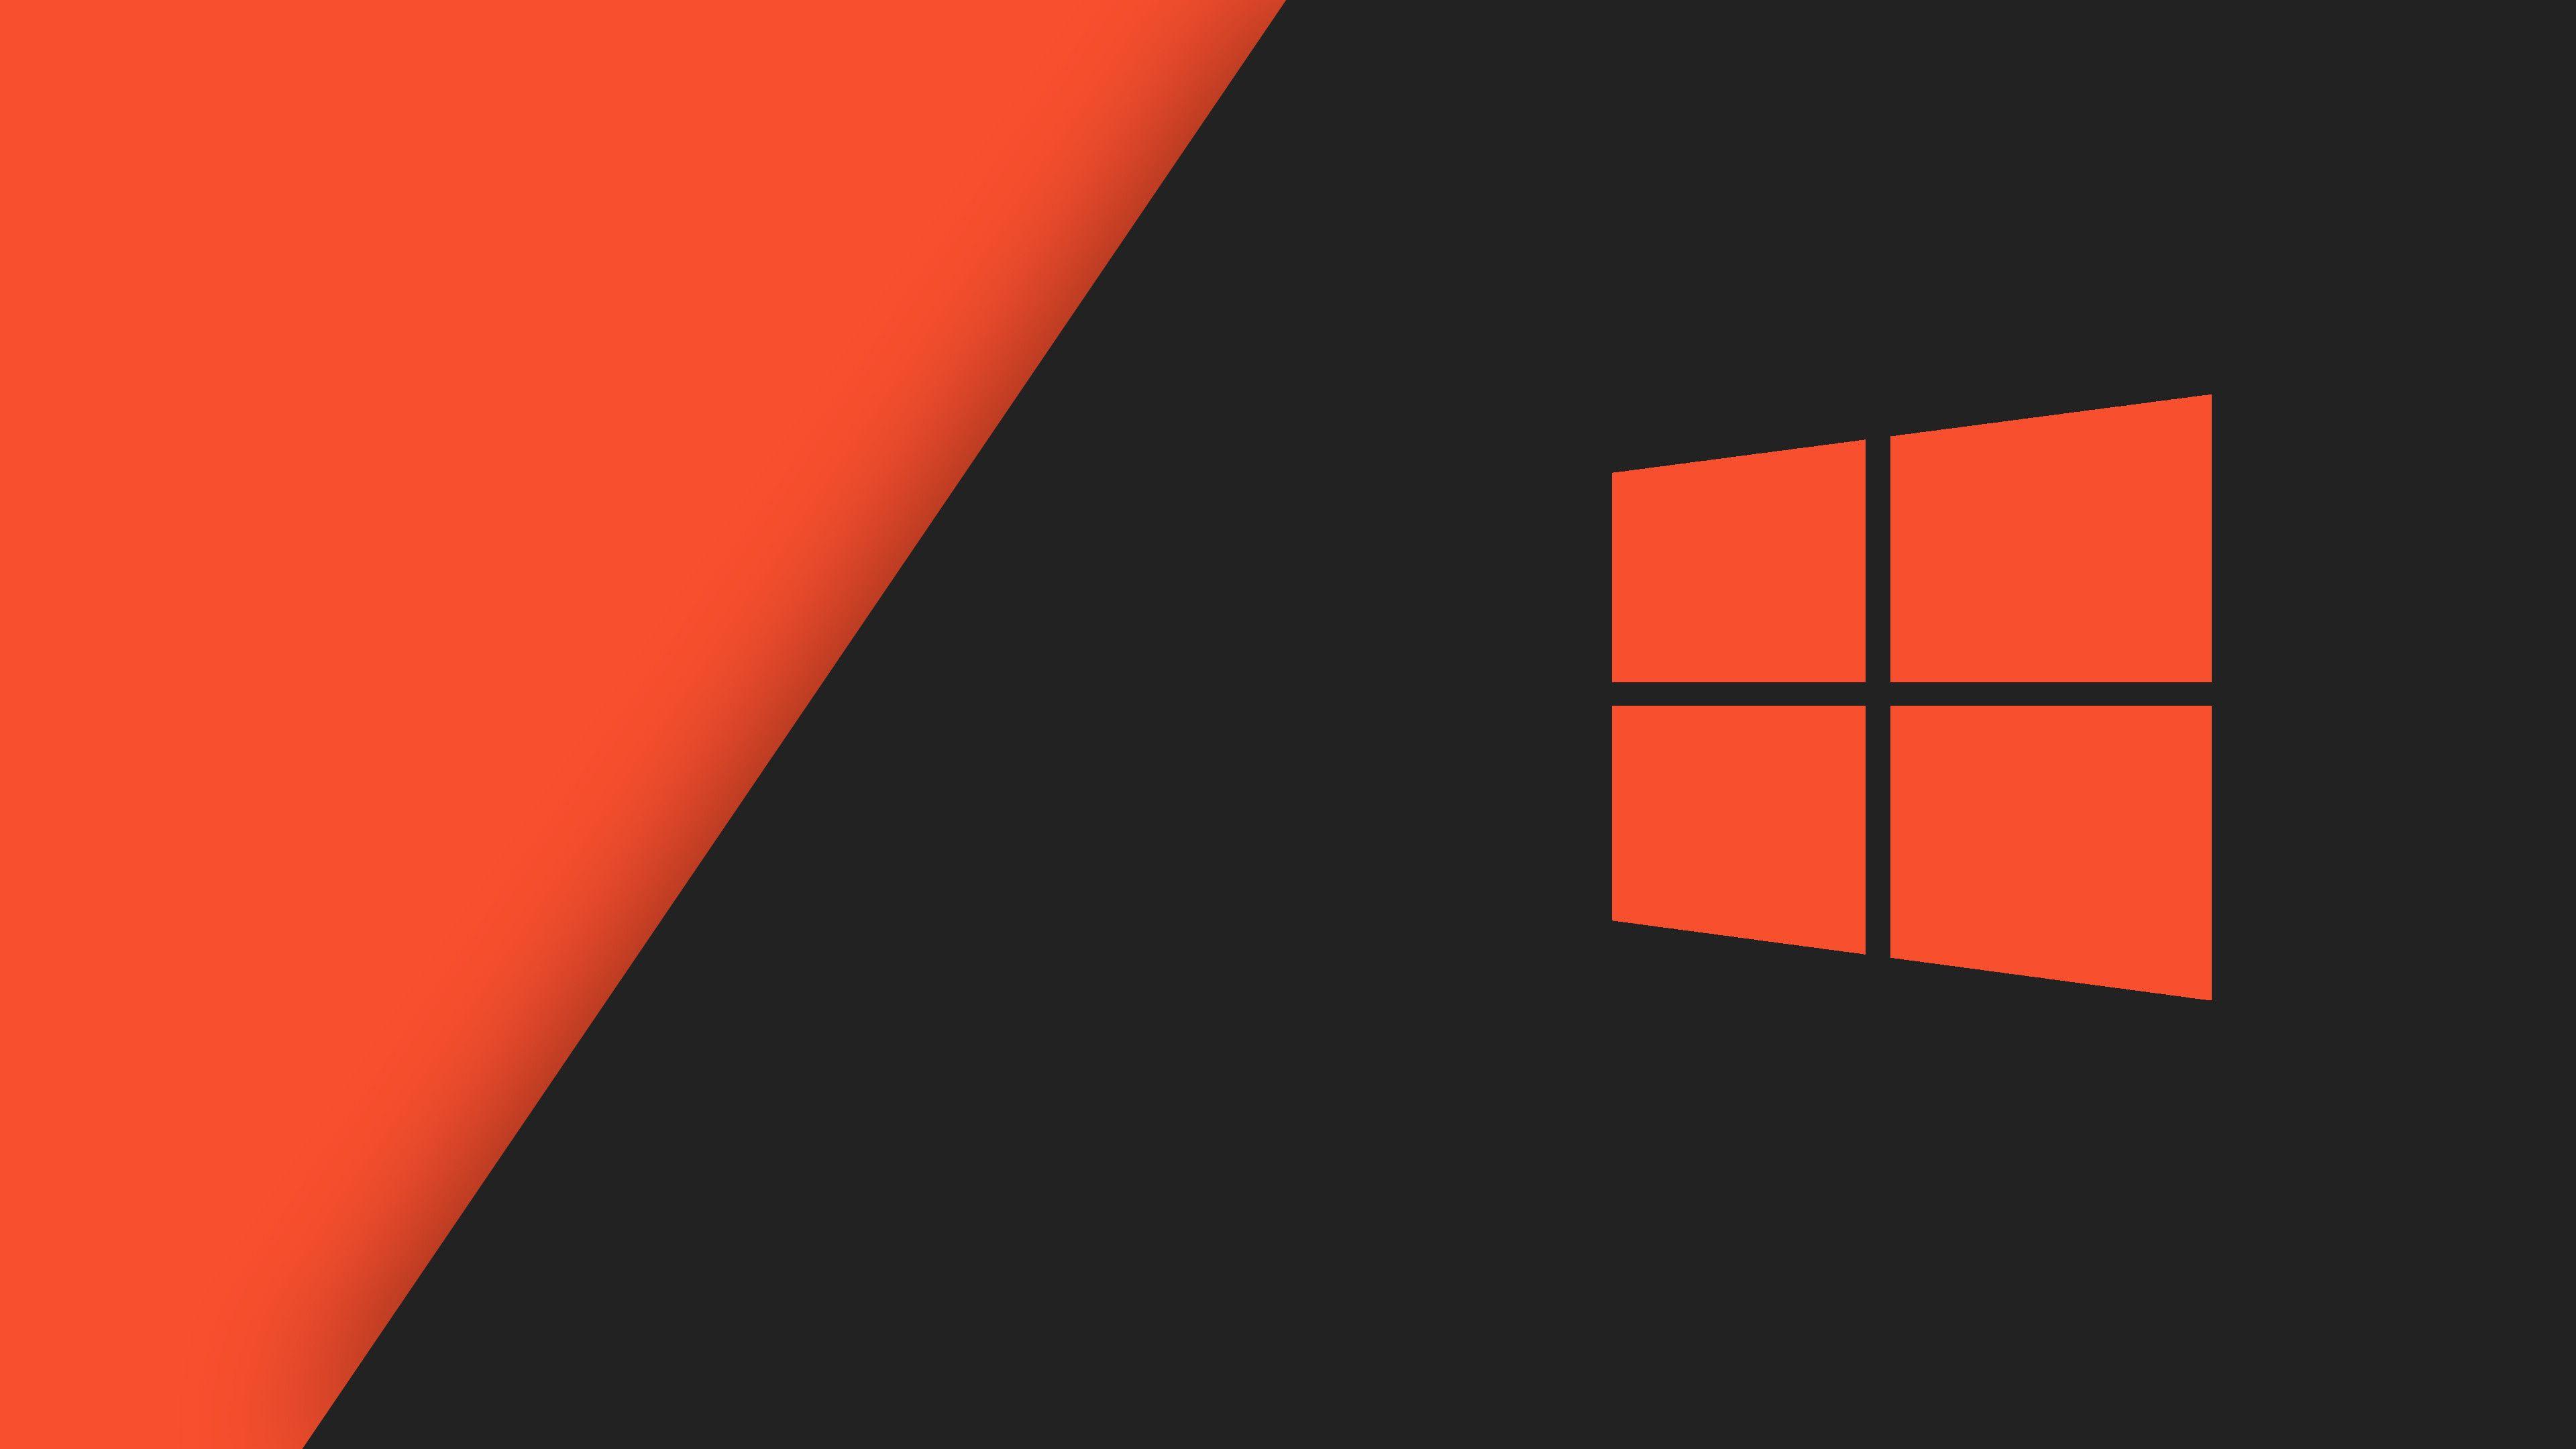 3840x2160 Orange Black Windows 10 Hd Wallpaper Wallpaper Windows 10 Samsung Wallpaper Uhd Wallpaper